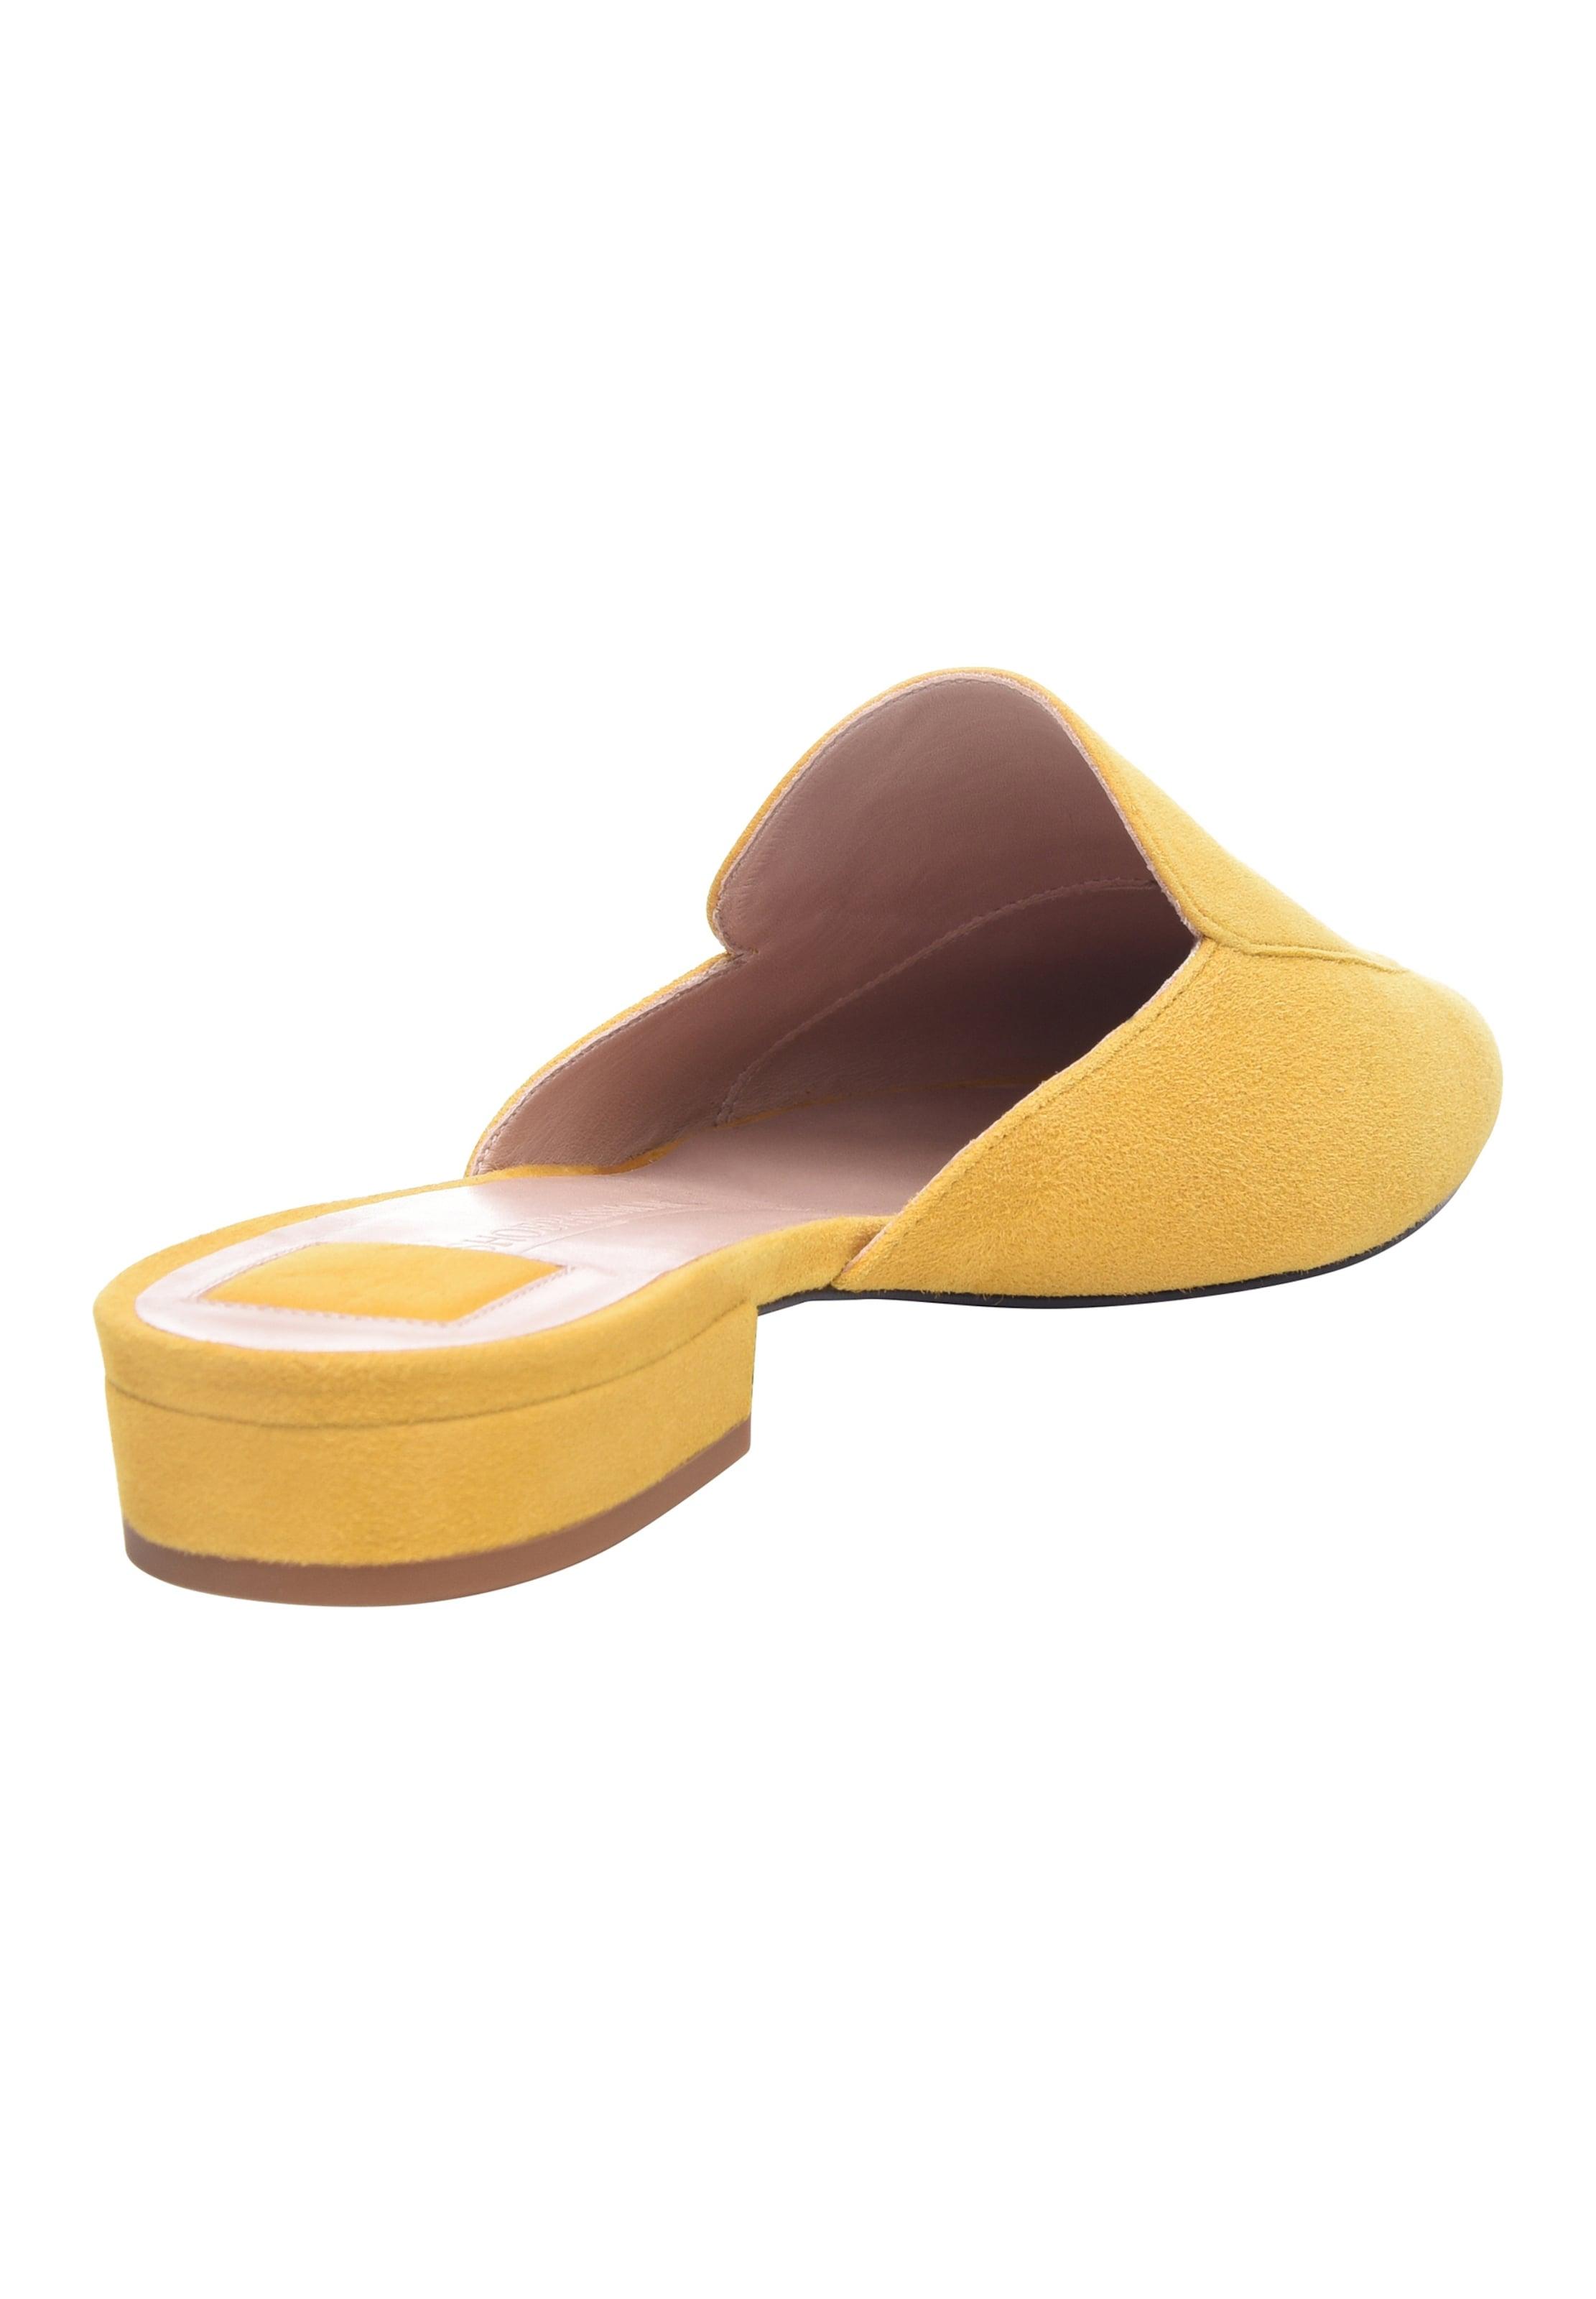 Wp' Gelb Shoepassion In Pantoletten 'no21 uOkXPZi